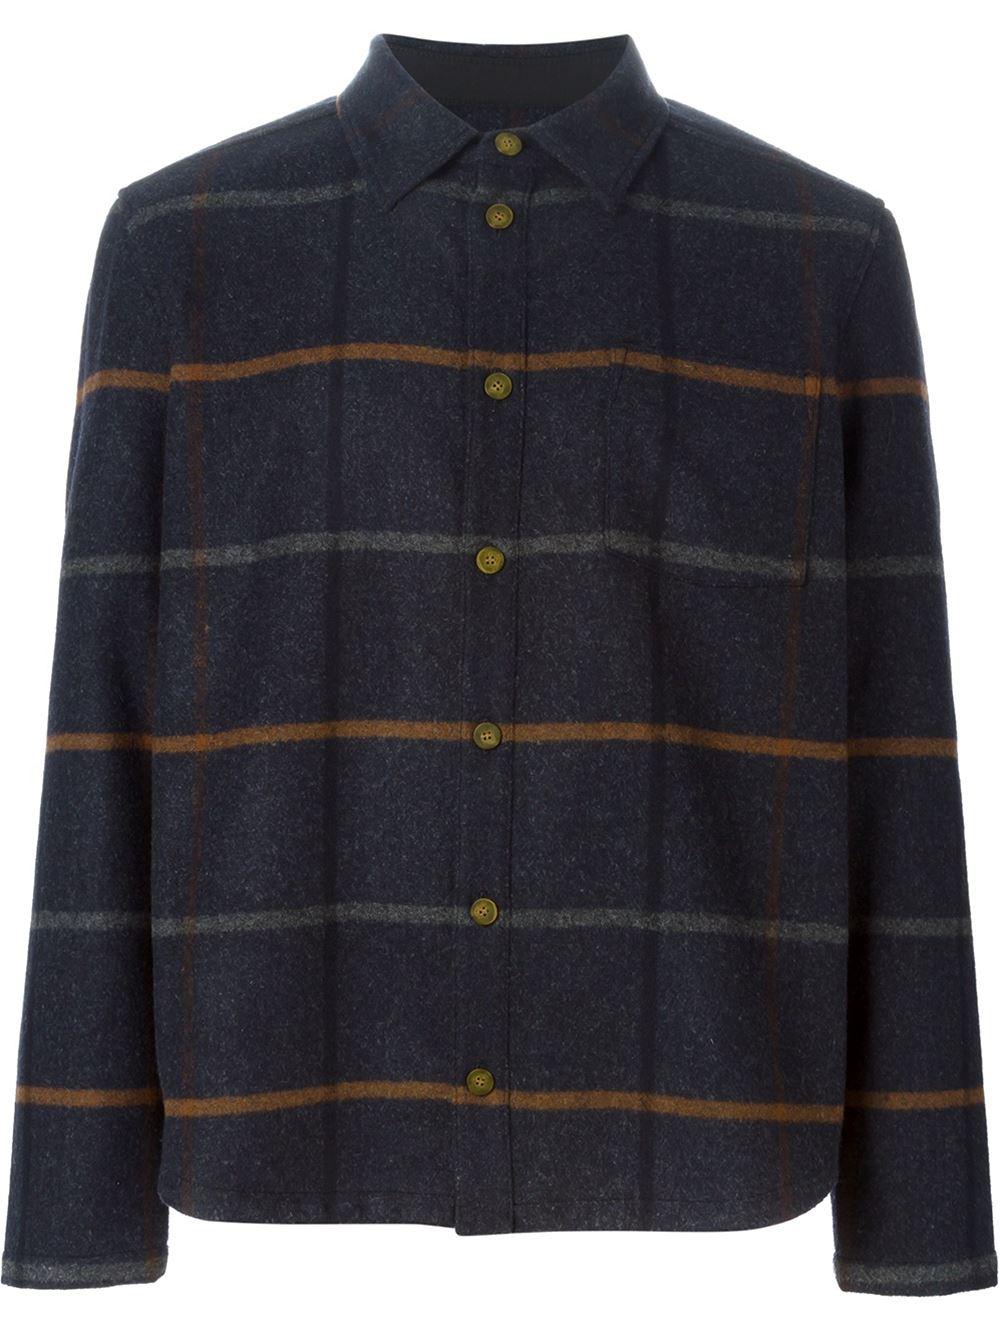 Hunter' shirt, £146.72, Libertine Libertine. www.farfetch.com